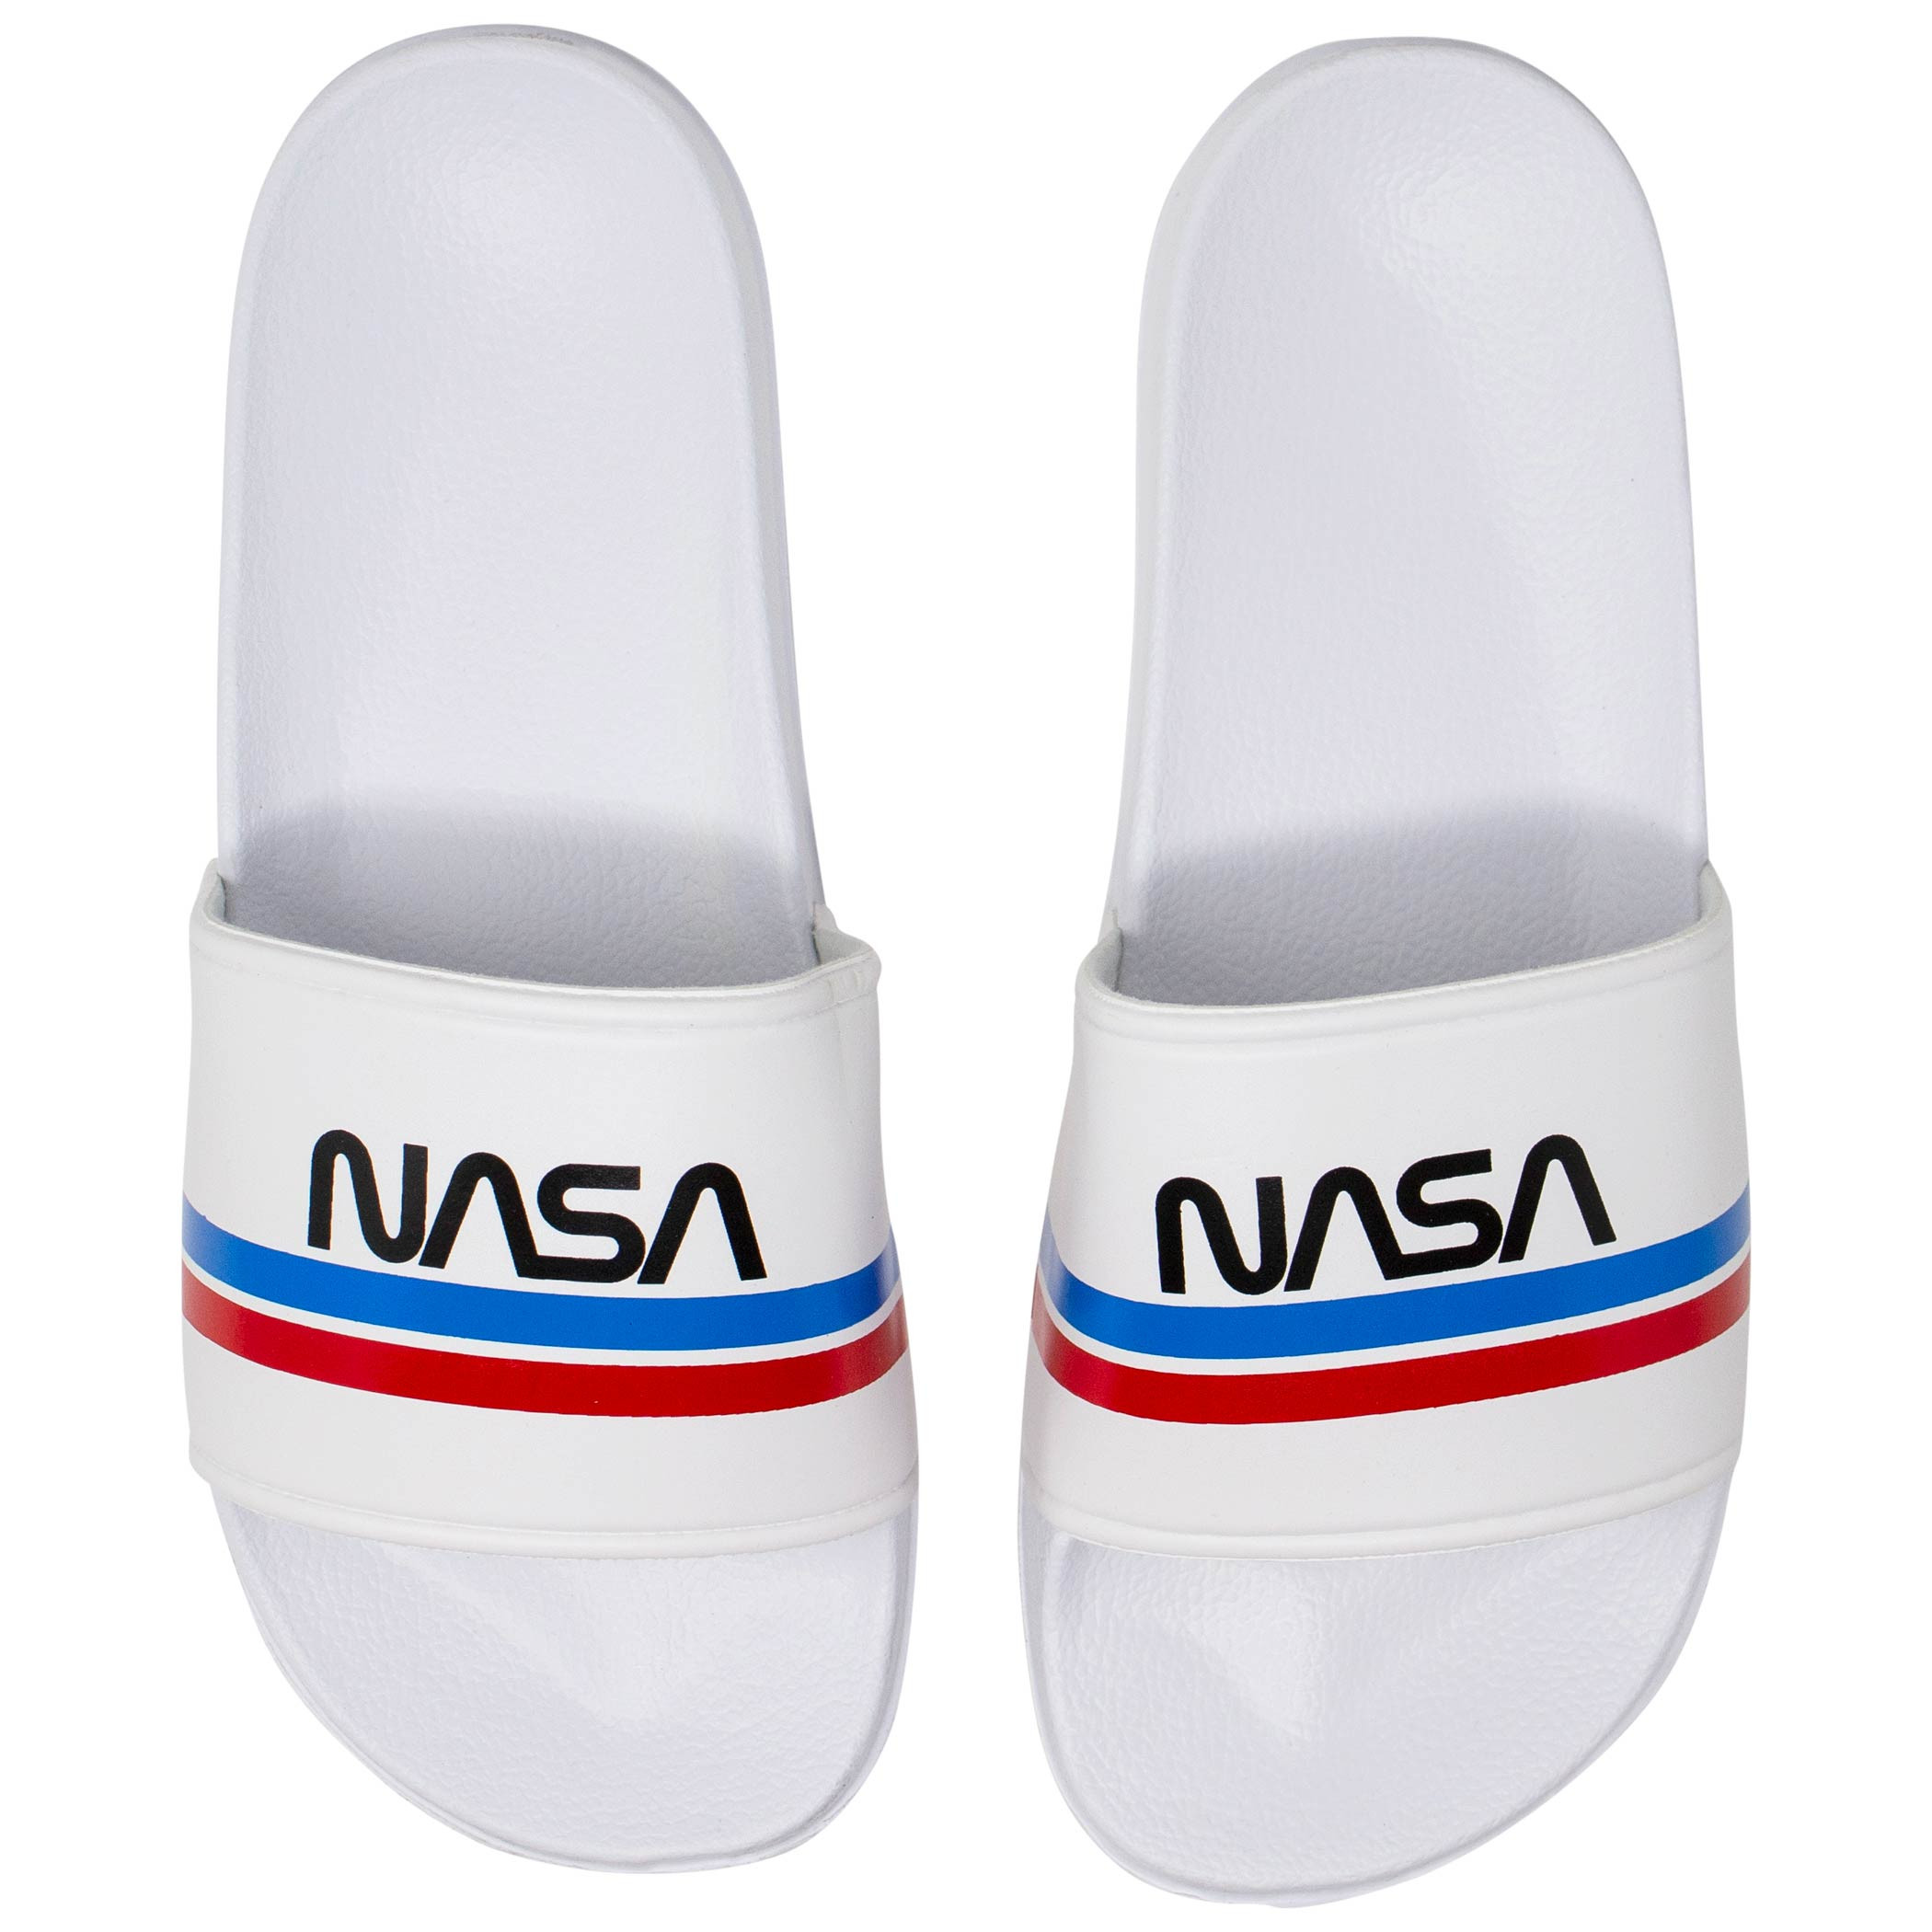 NASA Soccer Slides Sandals